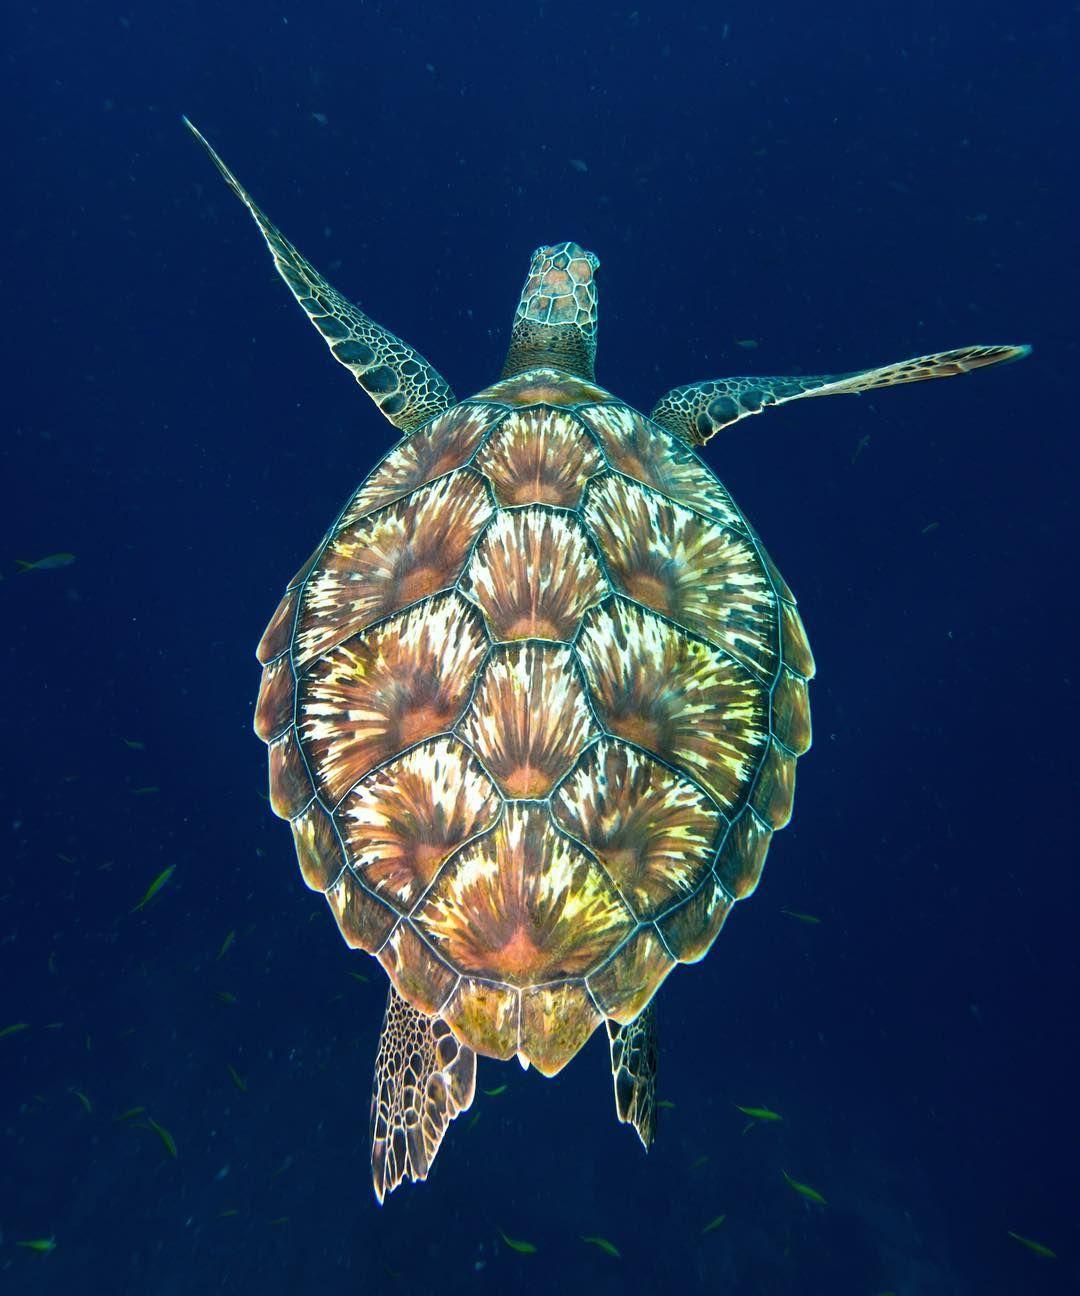 Happy #turtletuesday  #instafish #hawksbill #turtle #thailand #uwphotography #oceanlife #earthadventure #scubaaddict #thesea